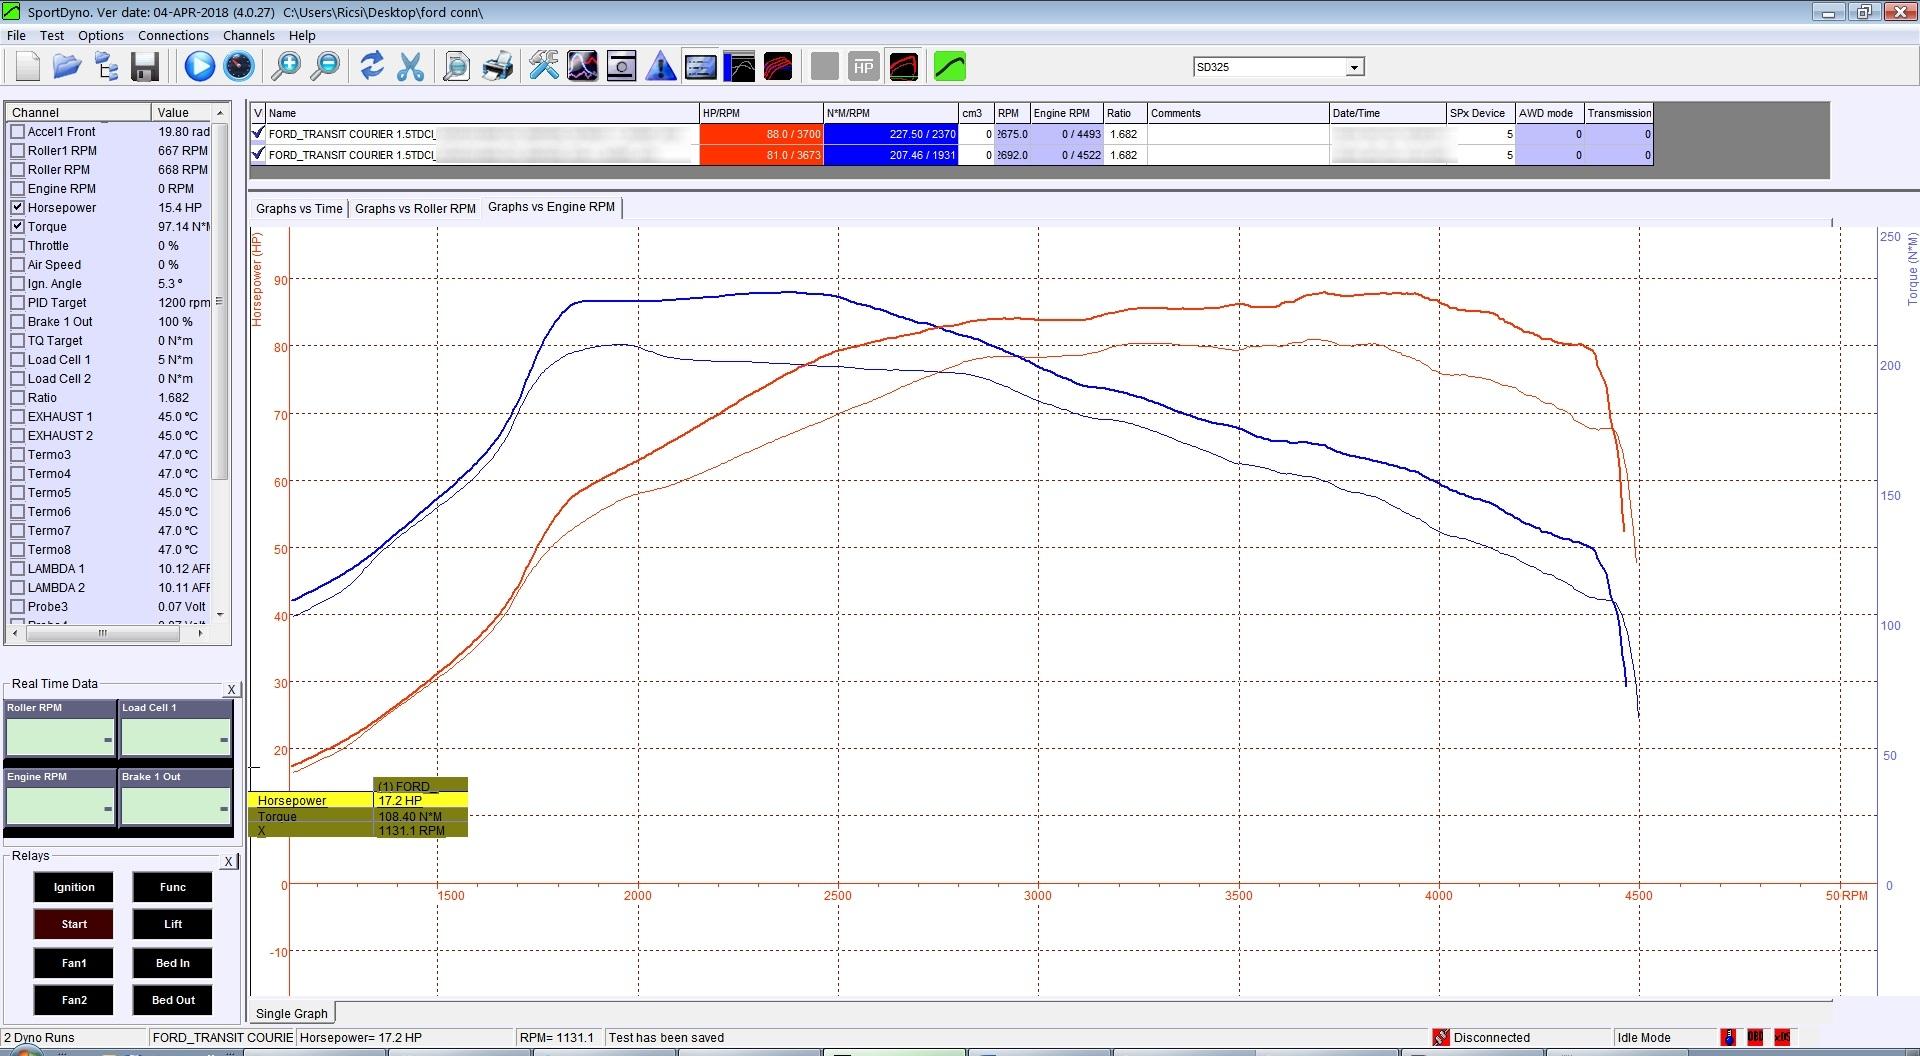 ford-b-max-1-5-tdci-075-chiptuning-dyno